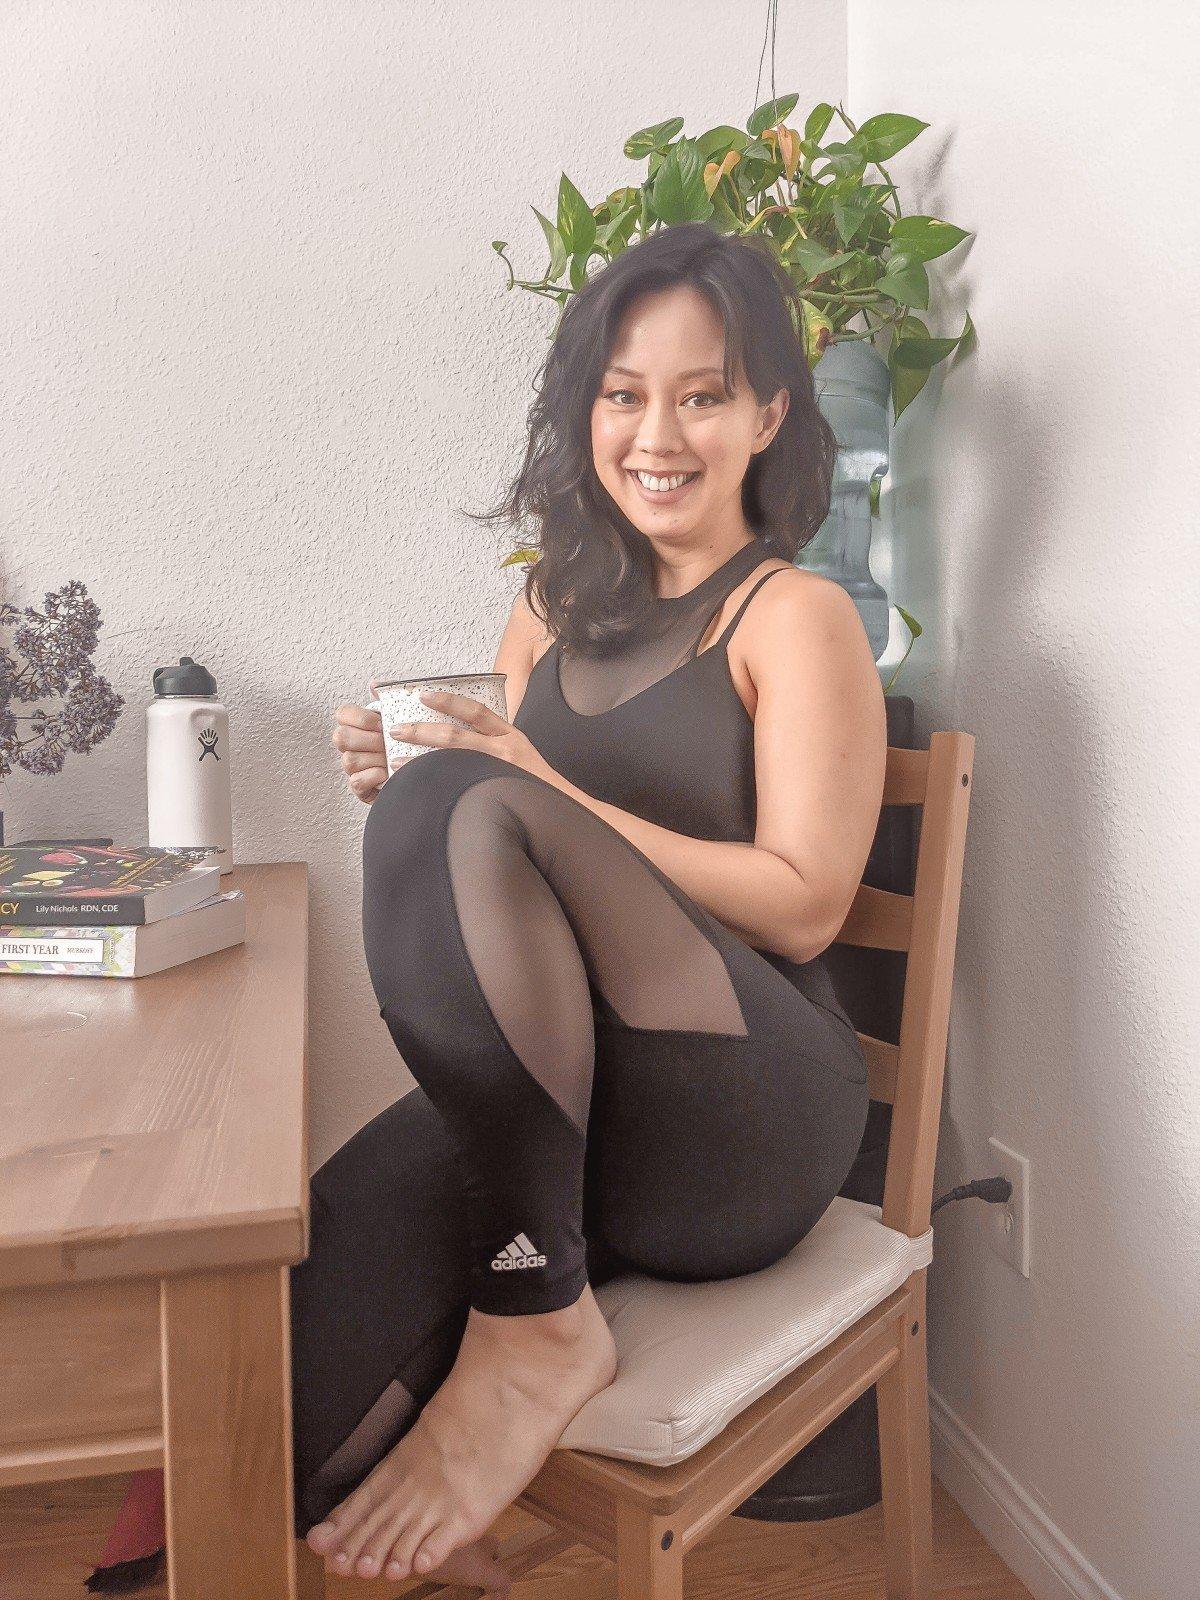 best home workouts on YouTube adidas women Serein Wu